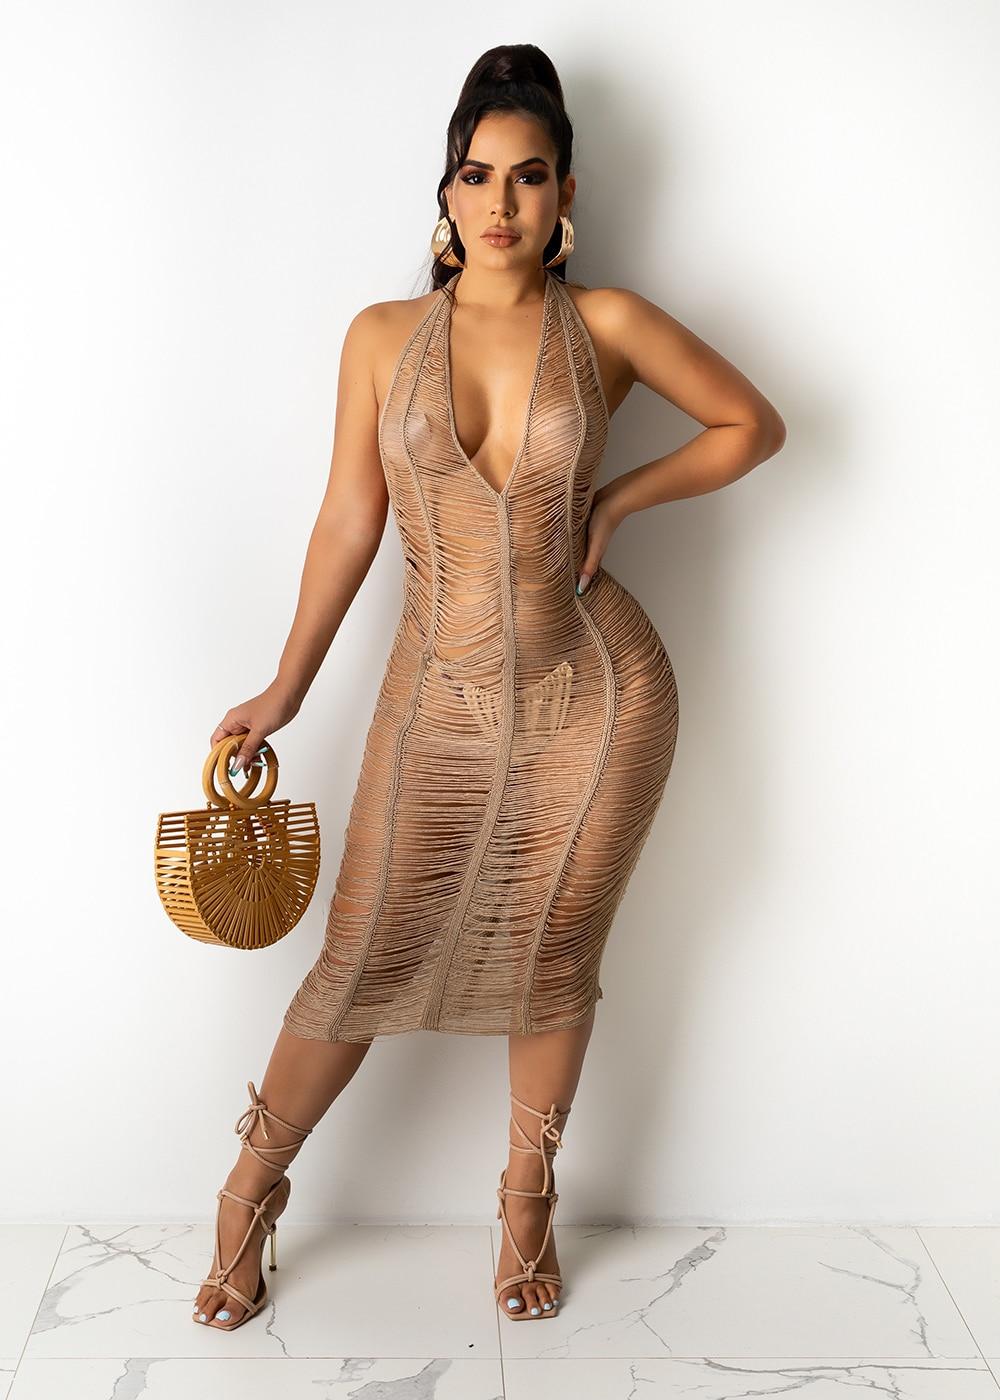 JRRY Sexy Women Knitted Dress Halter Backless Deep V Neck Crochet Dresses Sleeveless Hollow Out Bodycon Crocheted Beach Dress 1